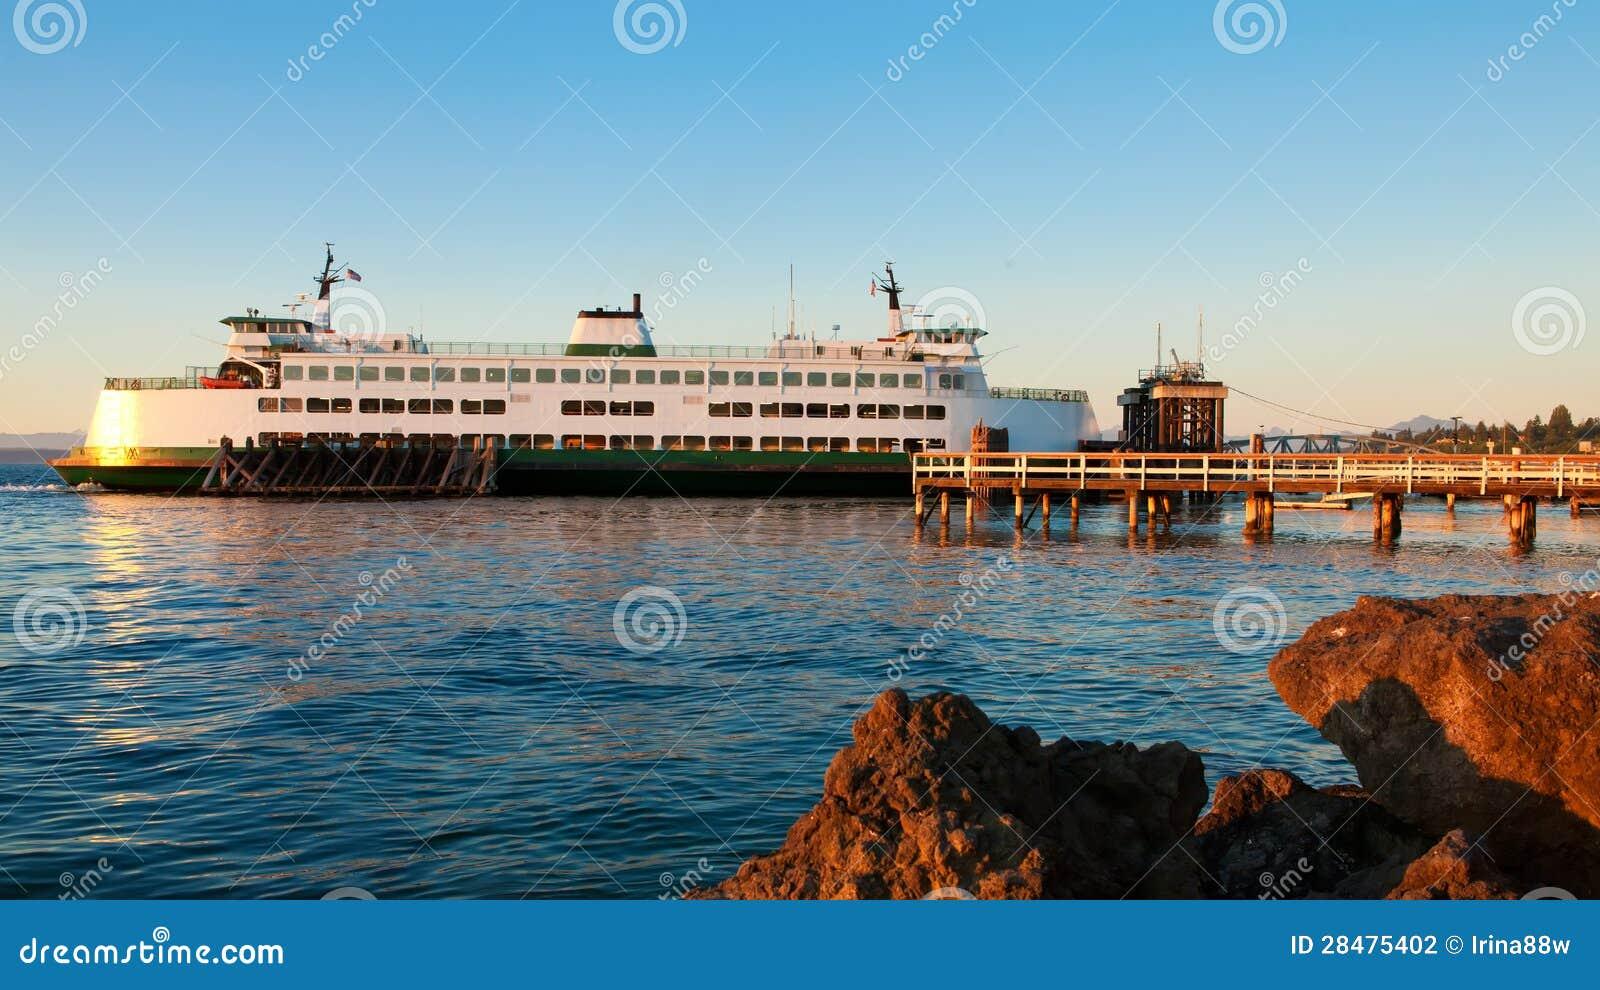 Washington State Ferry Travel Time